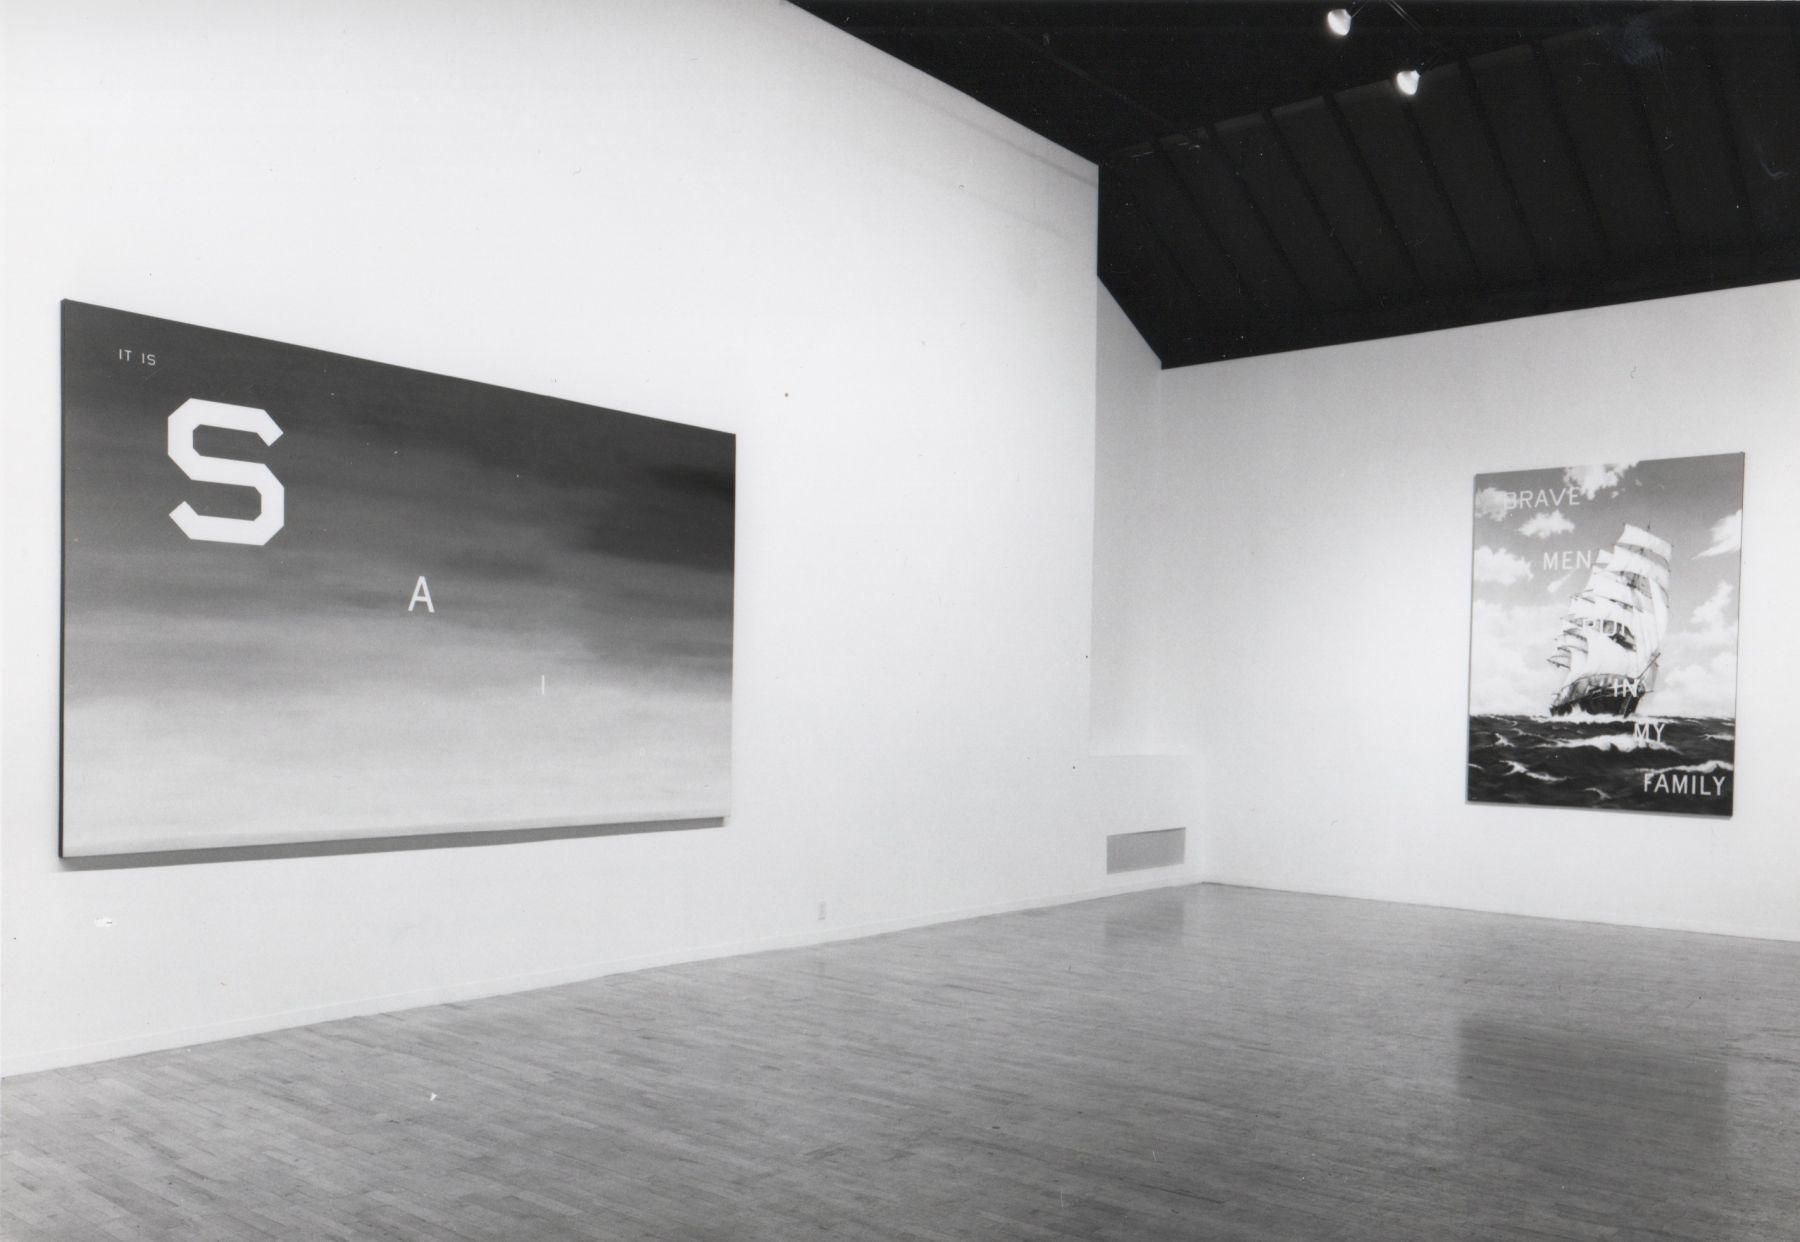 Installation view, Ed Ruscha, 142 GREENE.